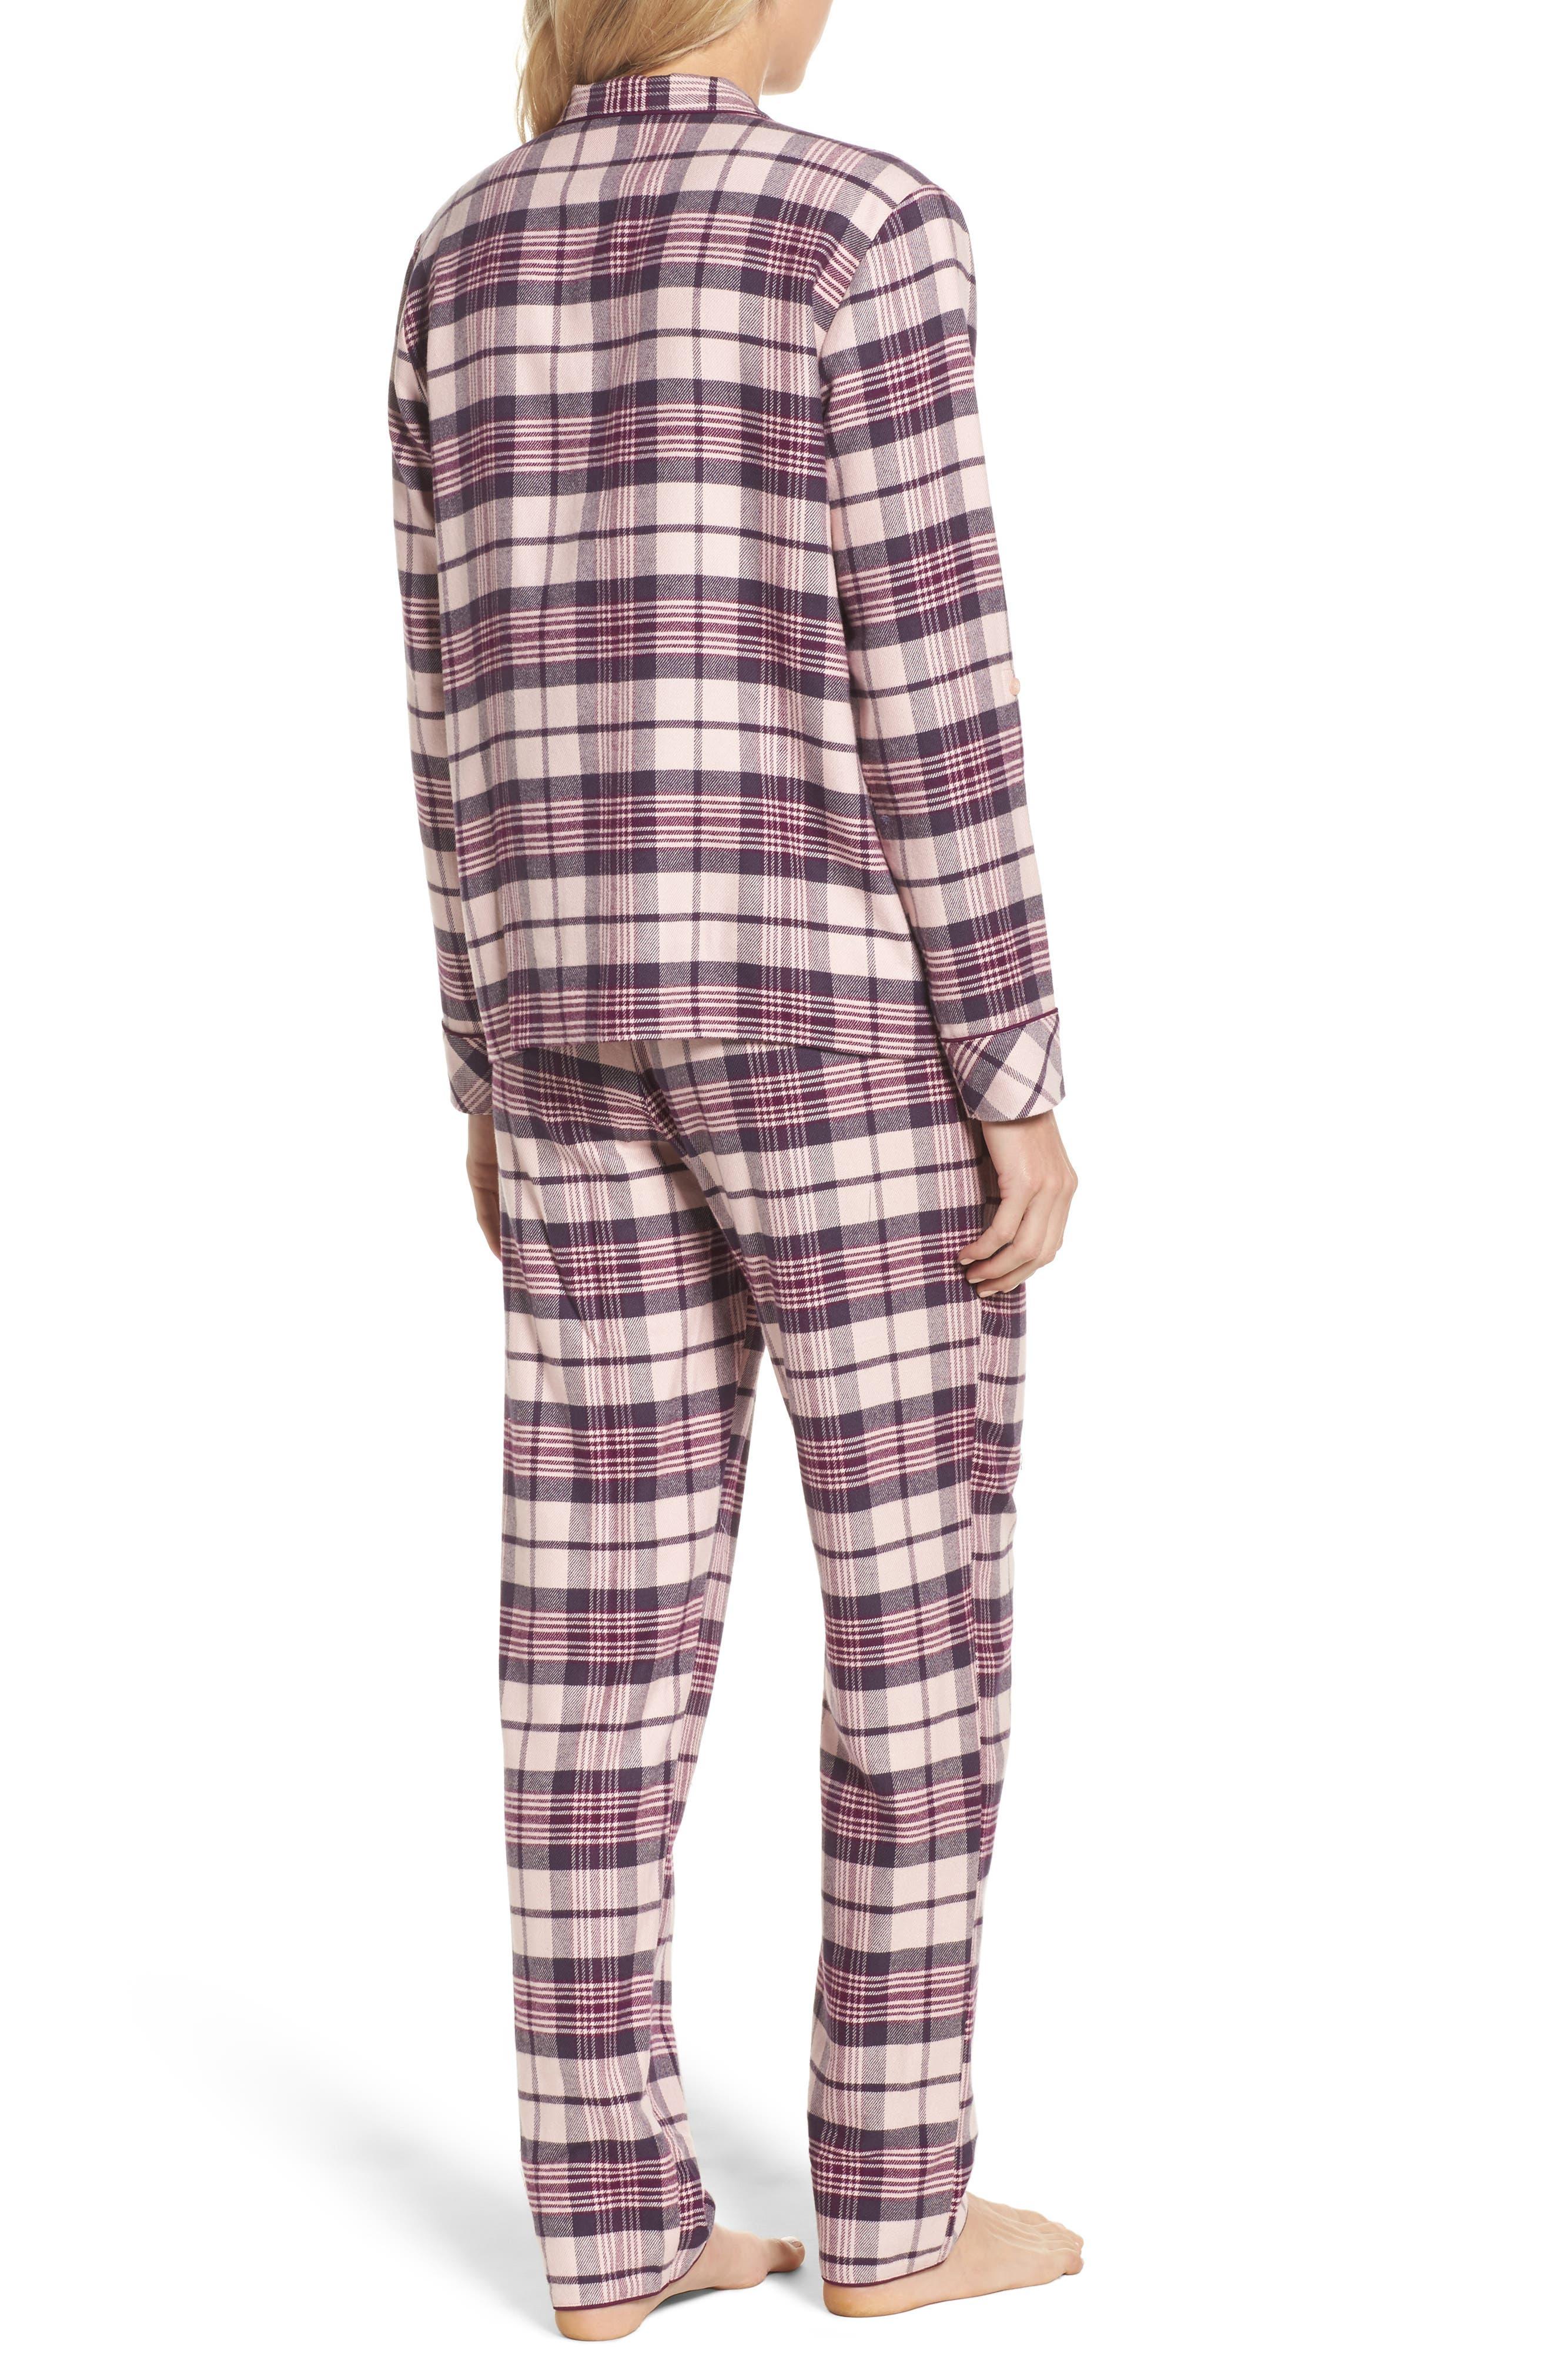 Lingerie Starlight Flannel Pajamas,                             Alternate thumbnail 2, color,                             Pink Peony Bud Tonal Tartan